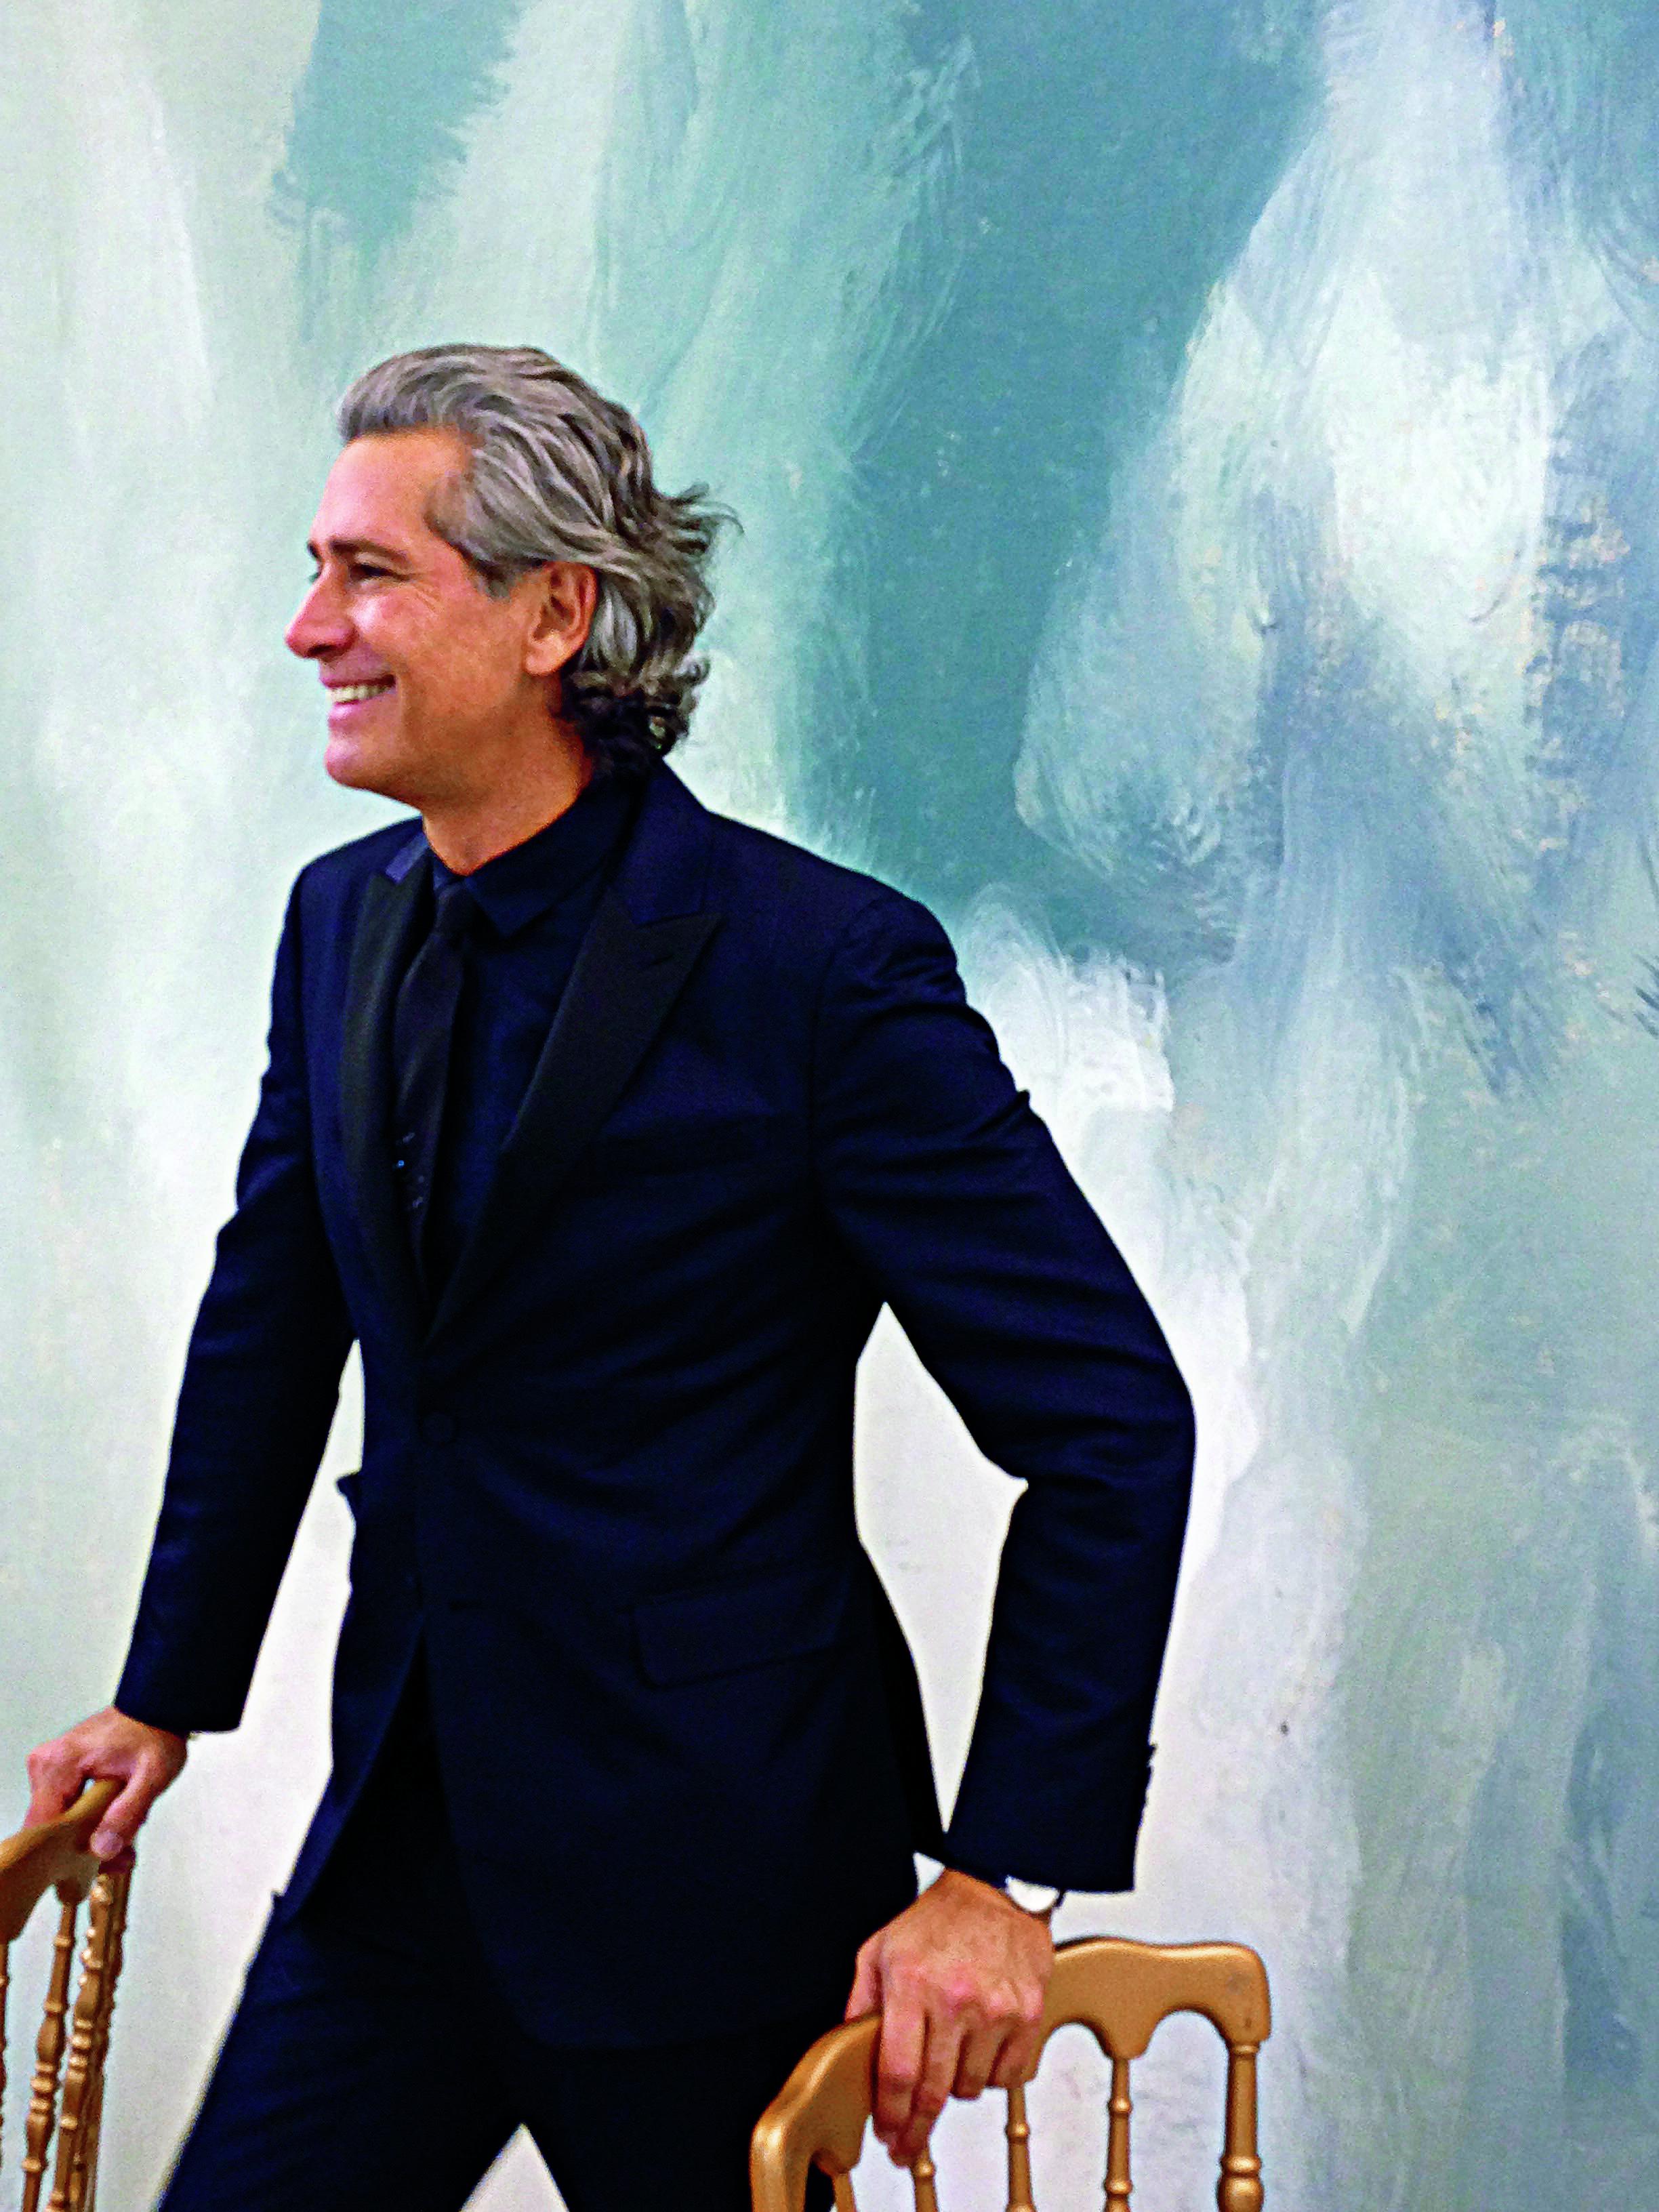 Carlos Souza (Valentino Worldwide Brand Ambassador)